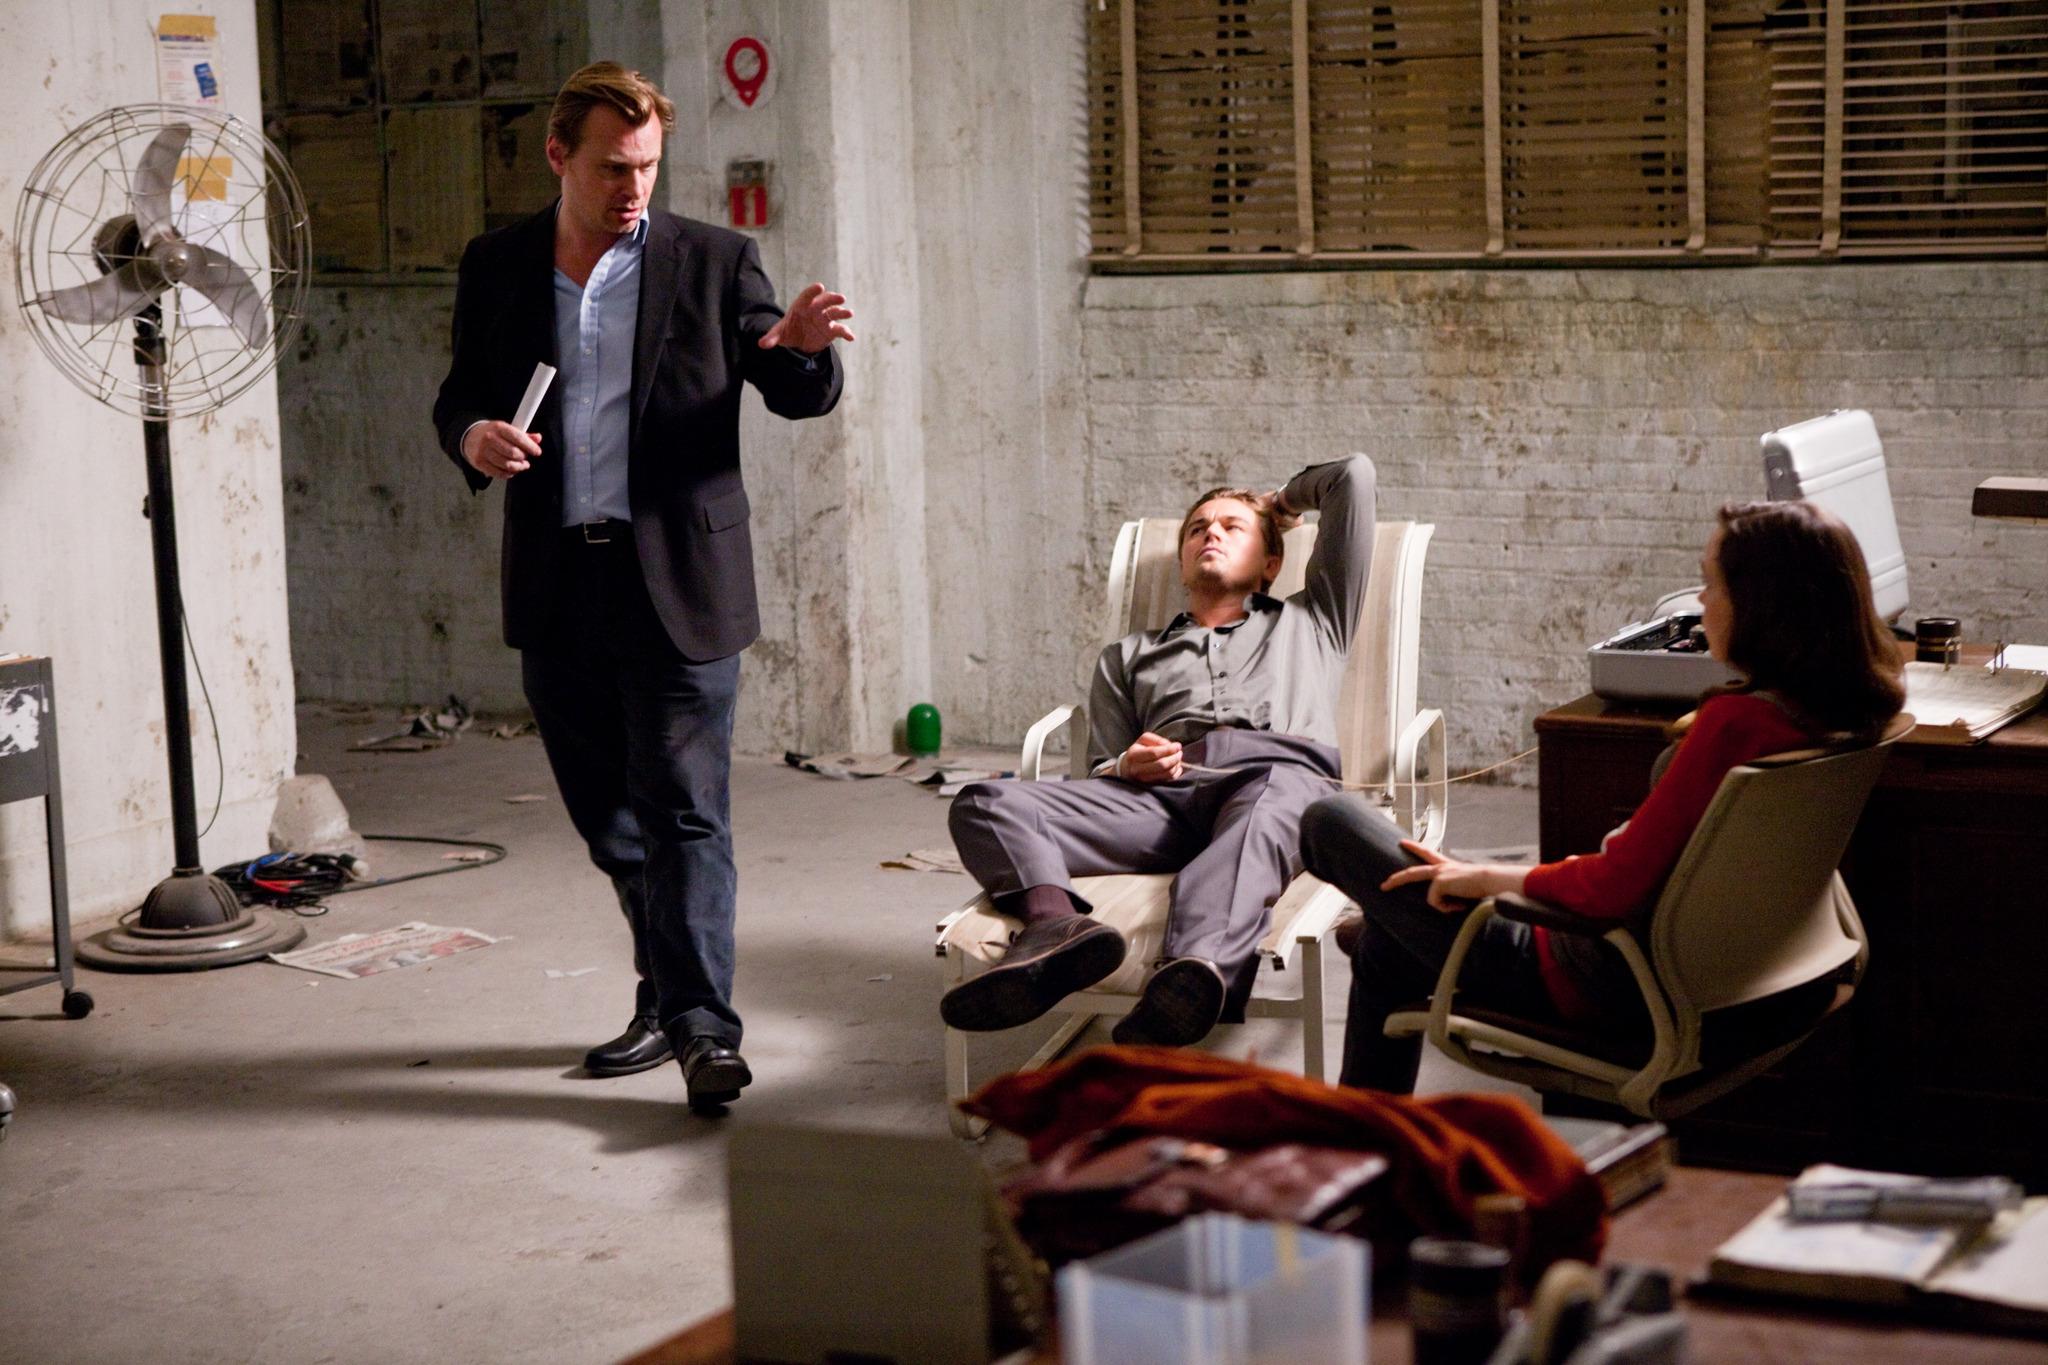 Leonardo DiCaprio, Christopher Nolan, and Elliot Page in Inception (2010)